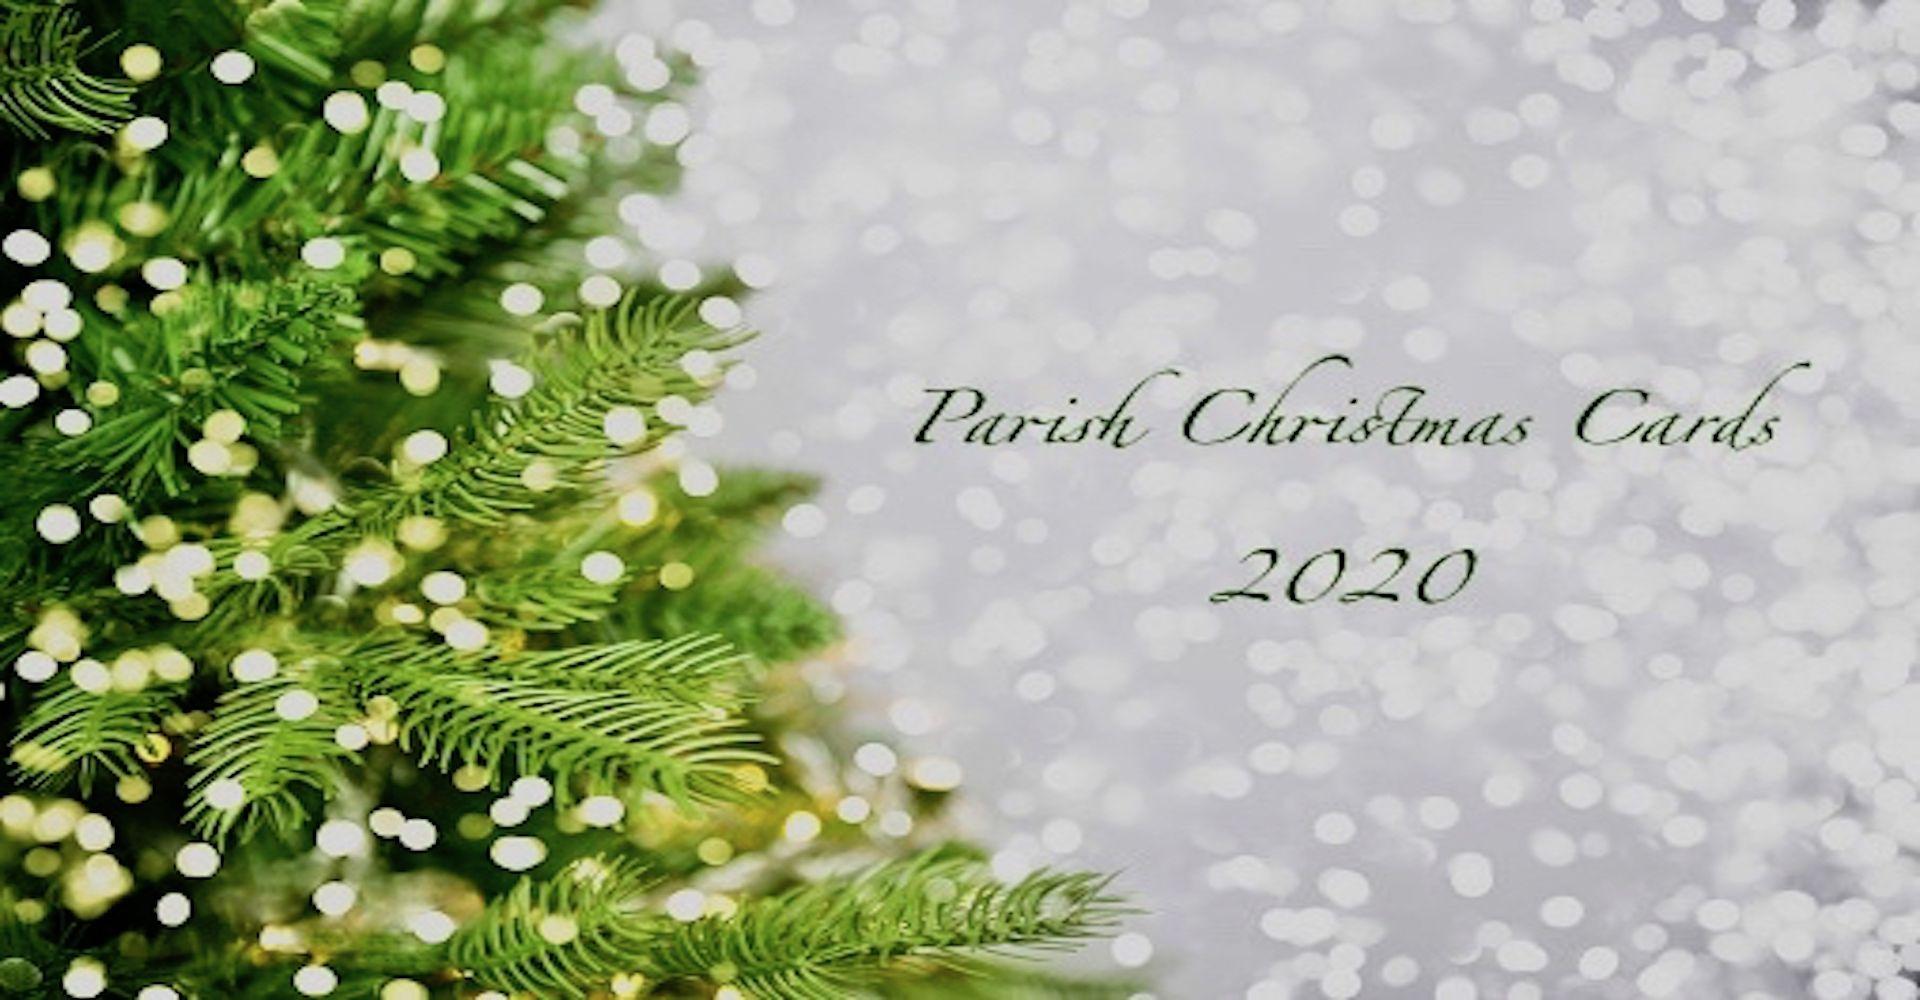 Ferrybank & Slieverue Parish Christmas Cards 2020- click for more details